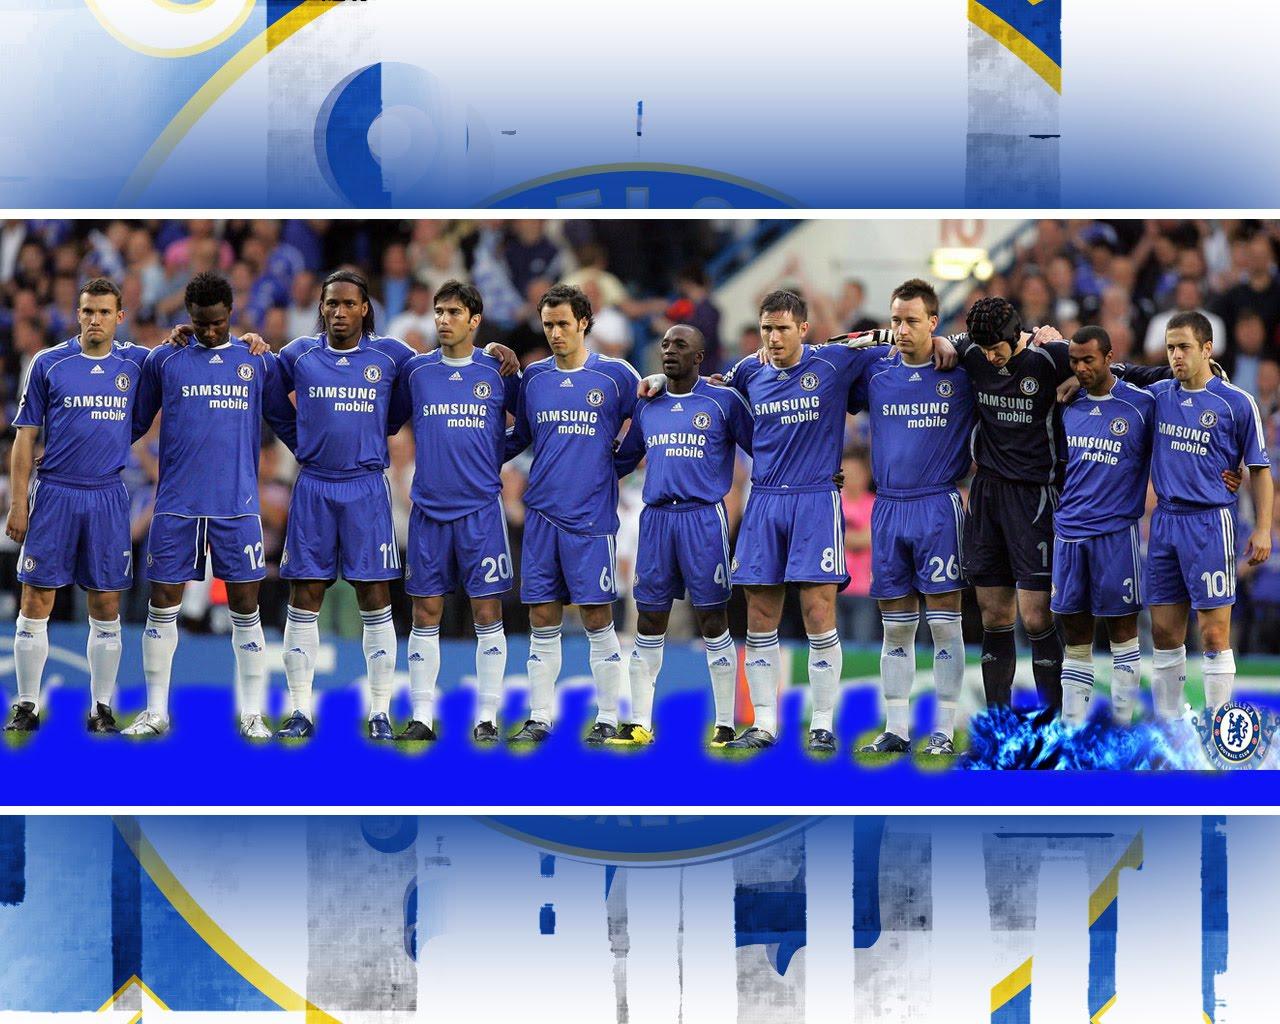 Chelsea Vs Manchester United Vs Fc Barcelona: Real Madrid Vs Manchester United